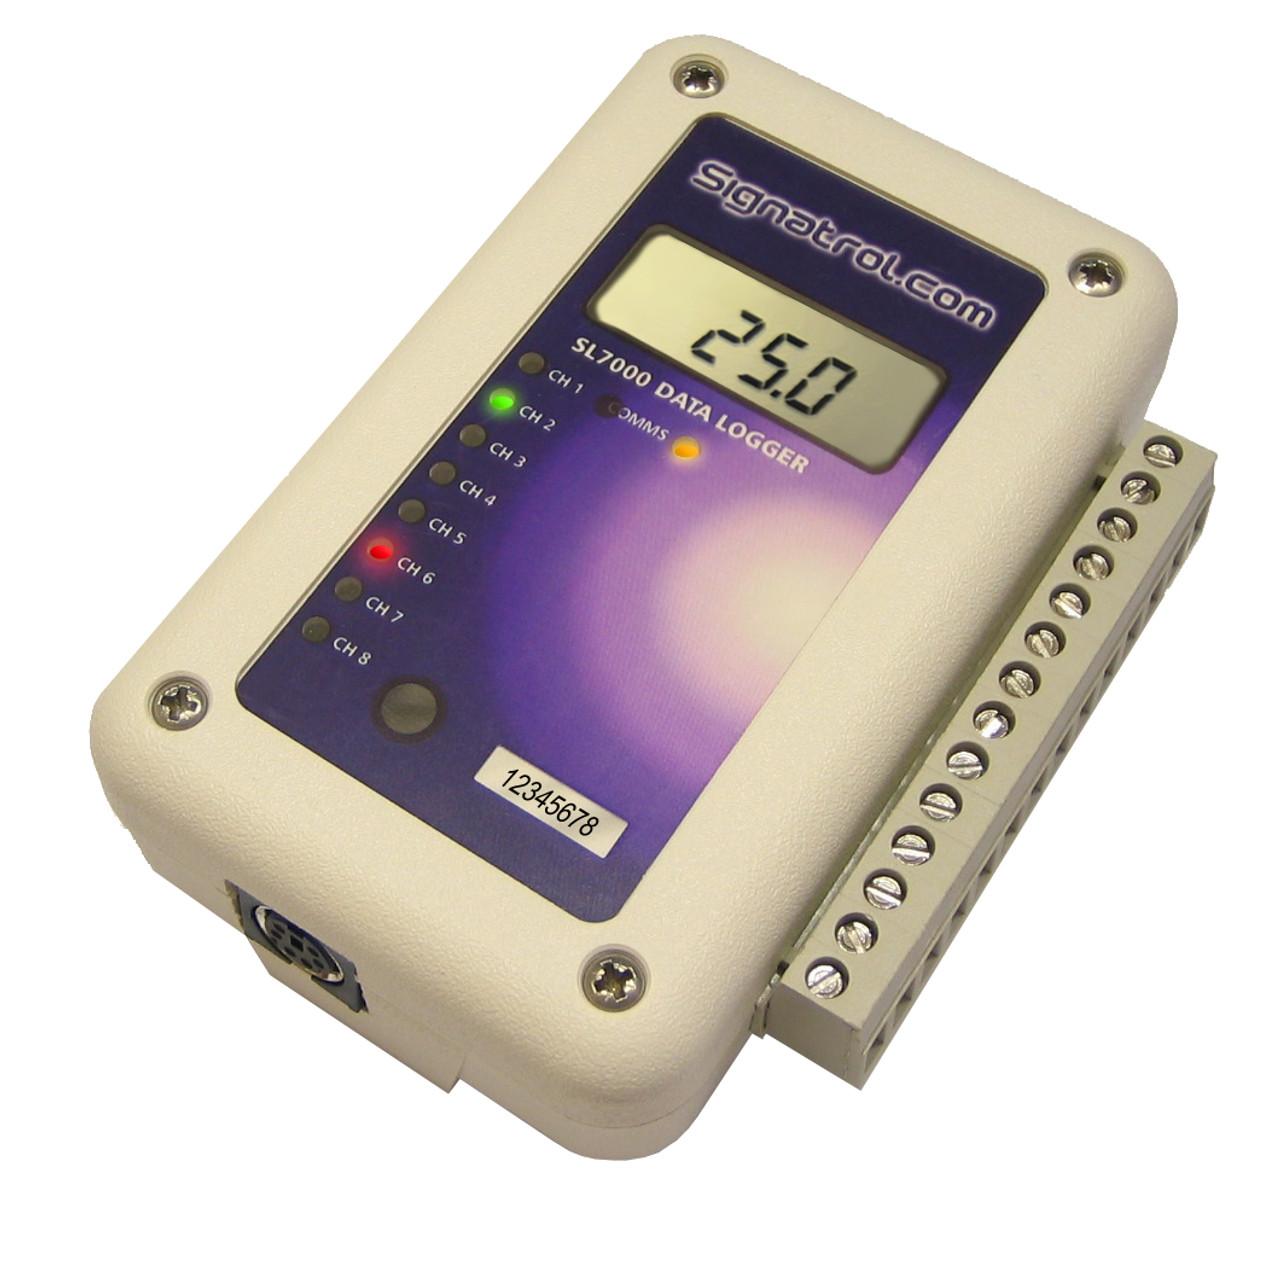 Signatrol SL7104 data logger.